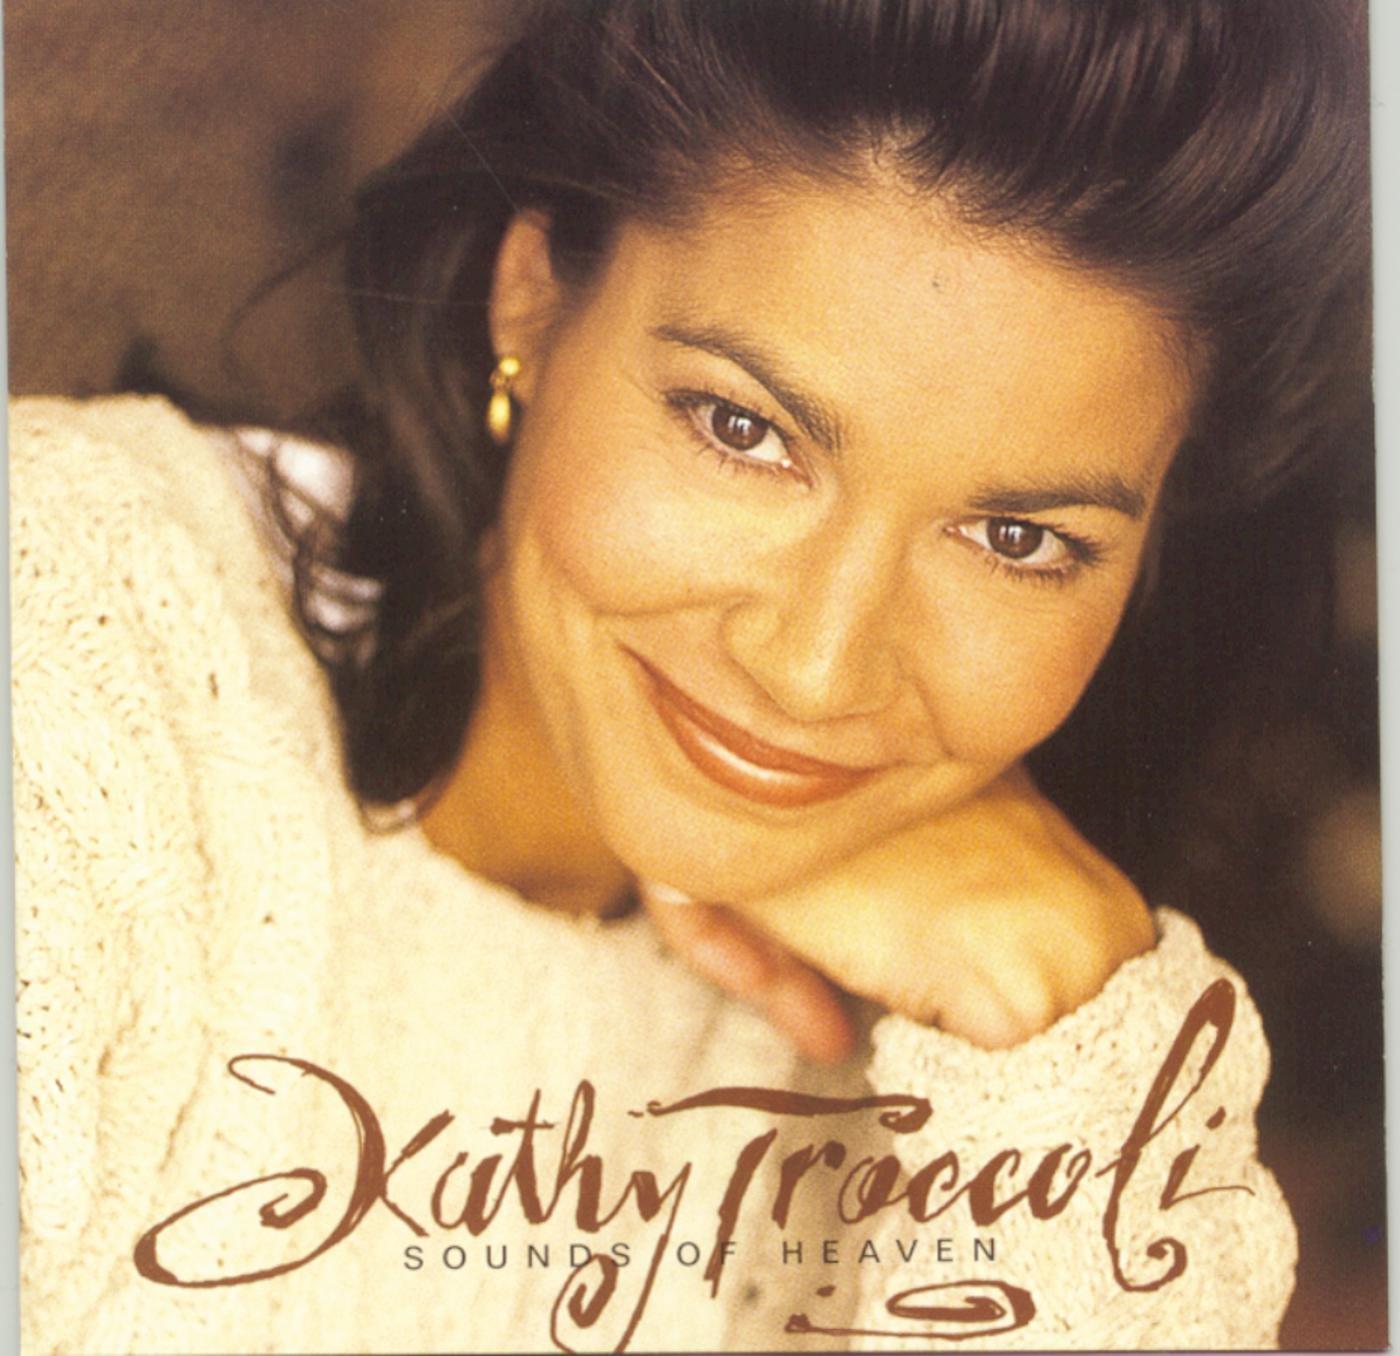 Kathy Troccoli - Sounds Of Heaven (1995) [FLAC] Download